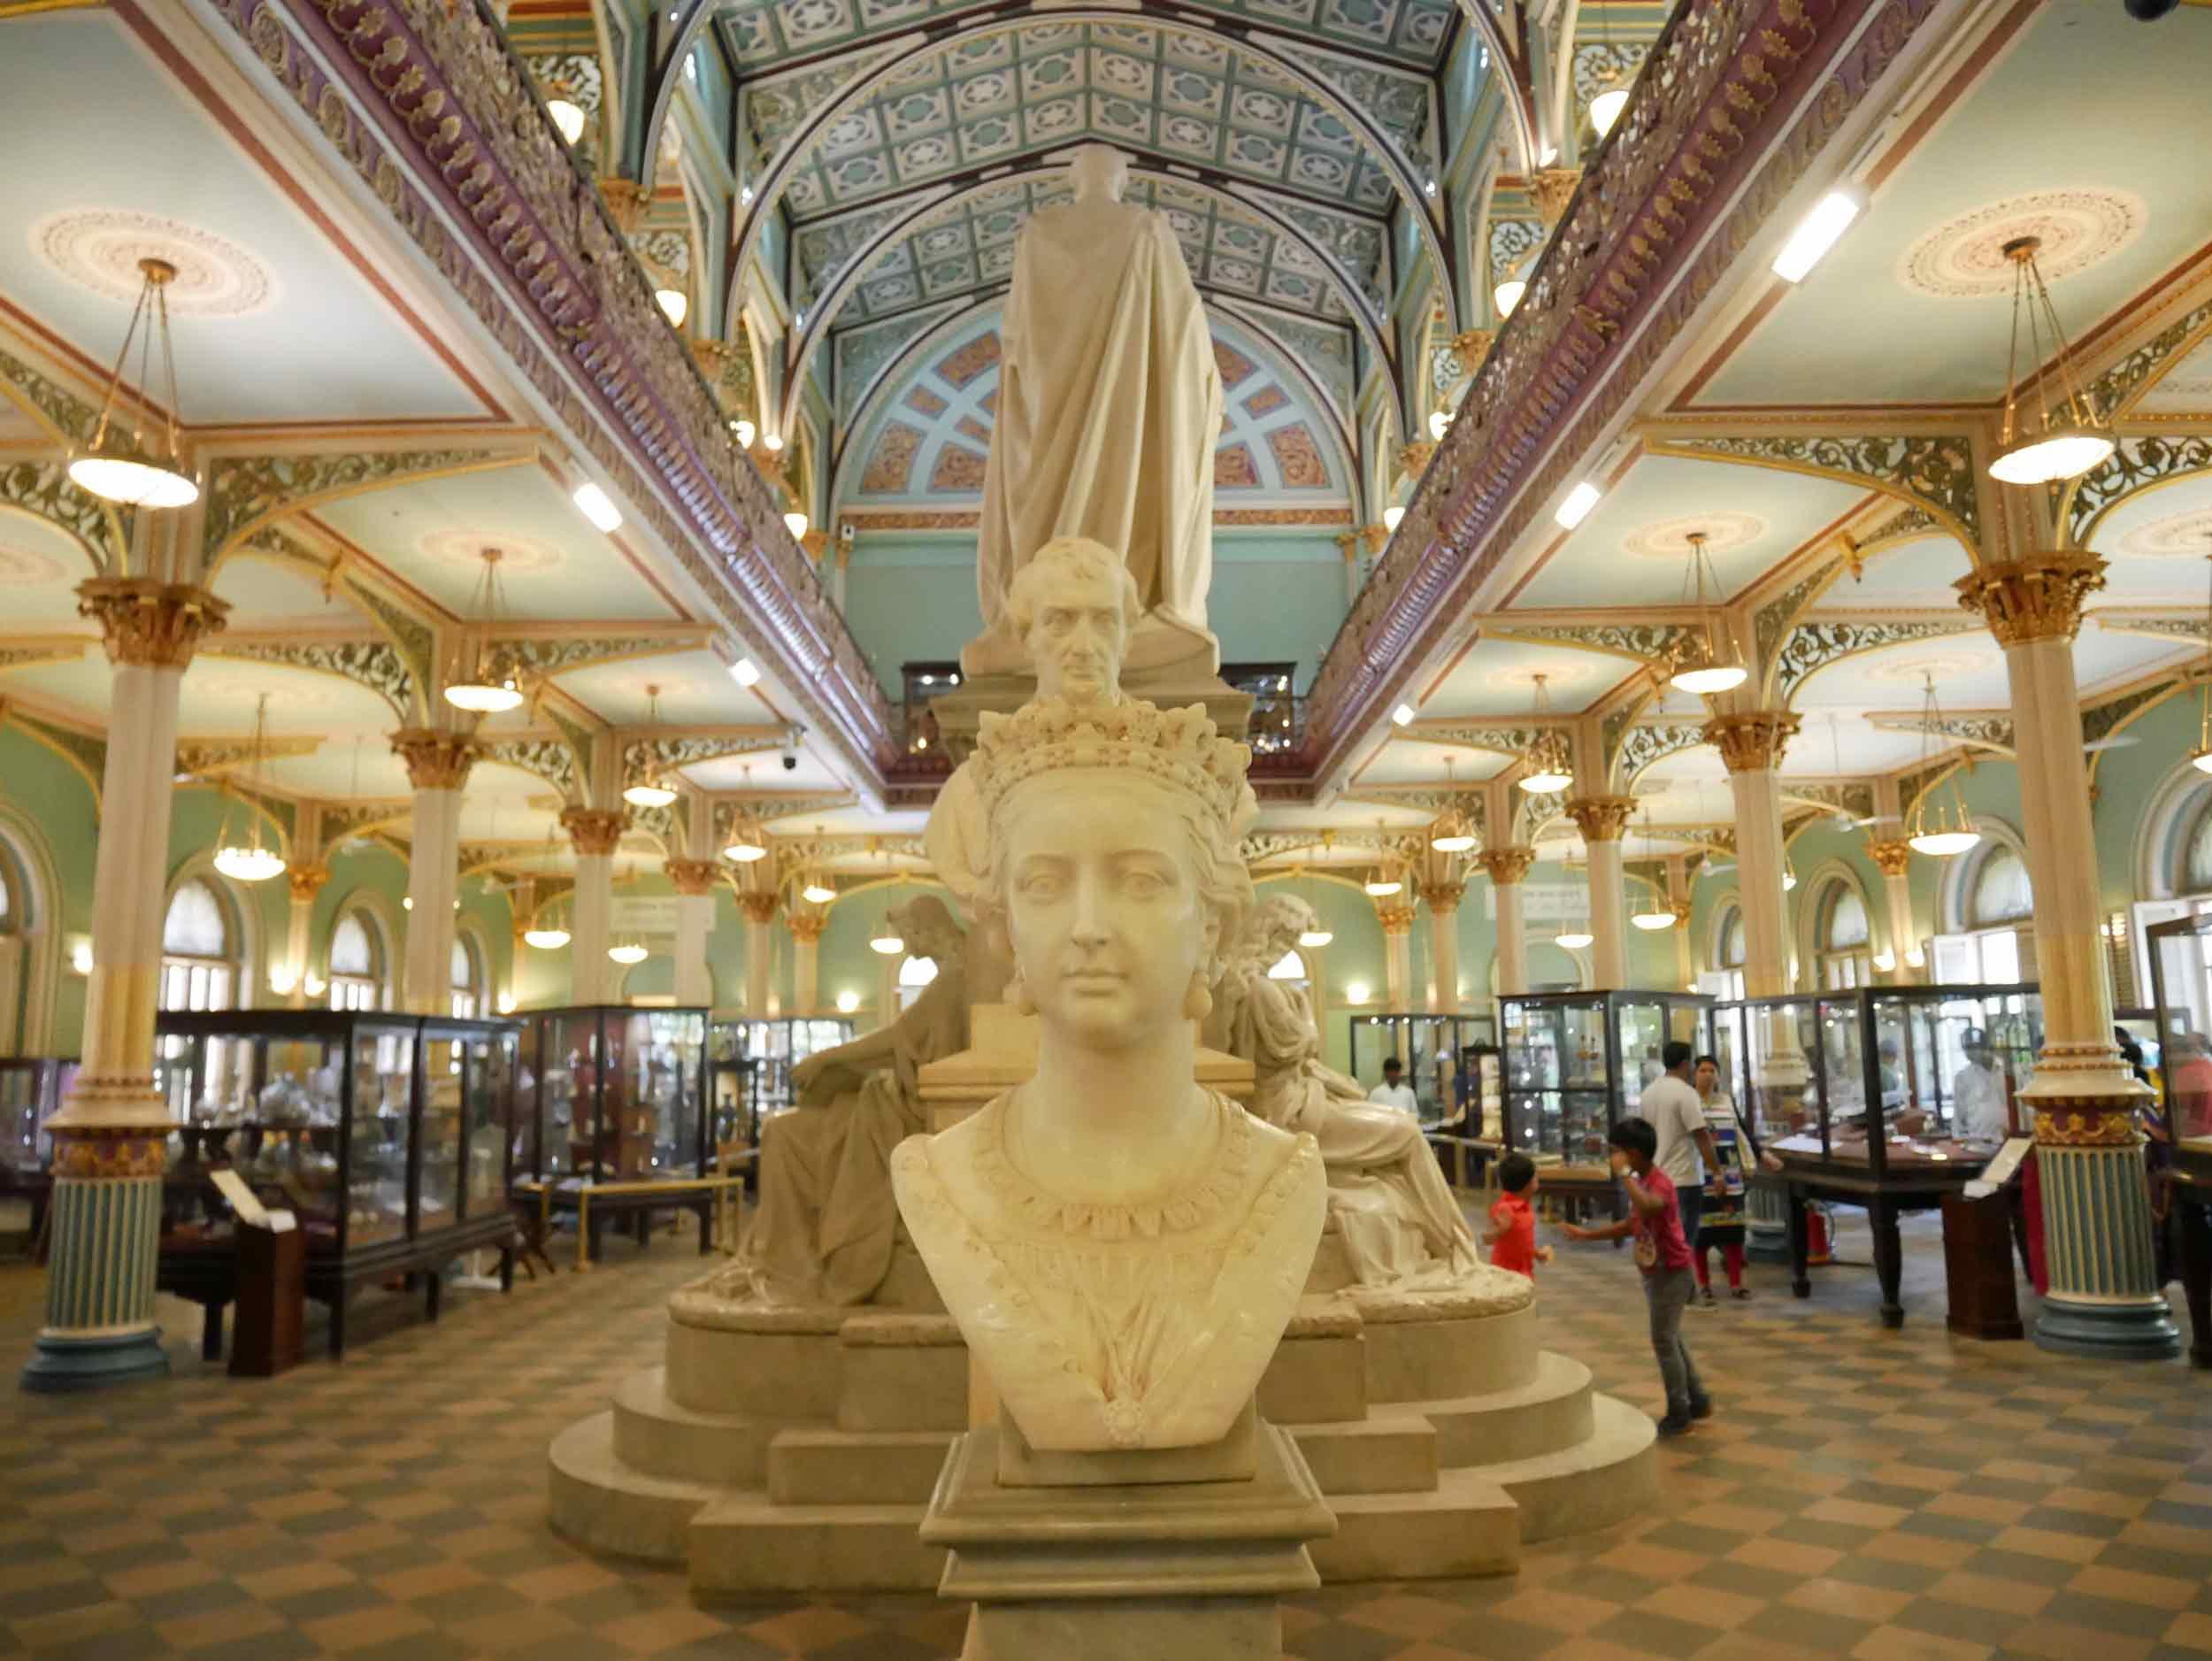 The Dr. Bhau Daji Lad Museum is the oldest museum in Mumbai (Oct 28).